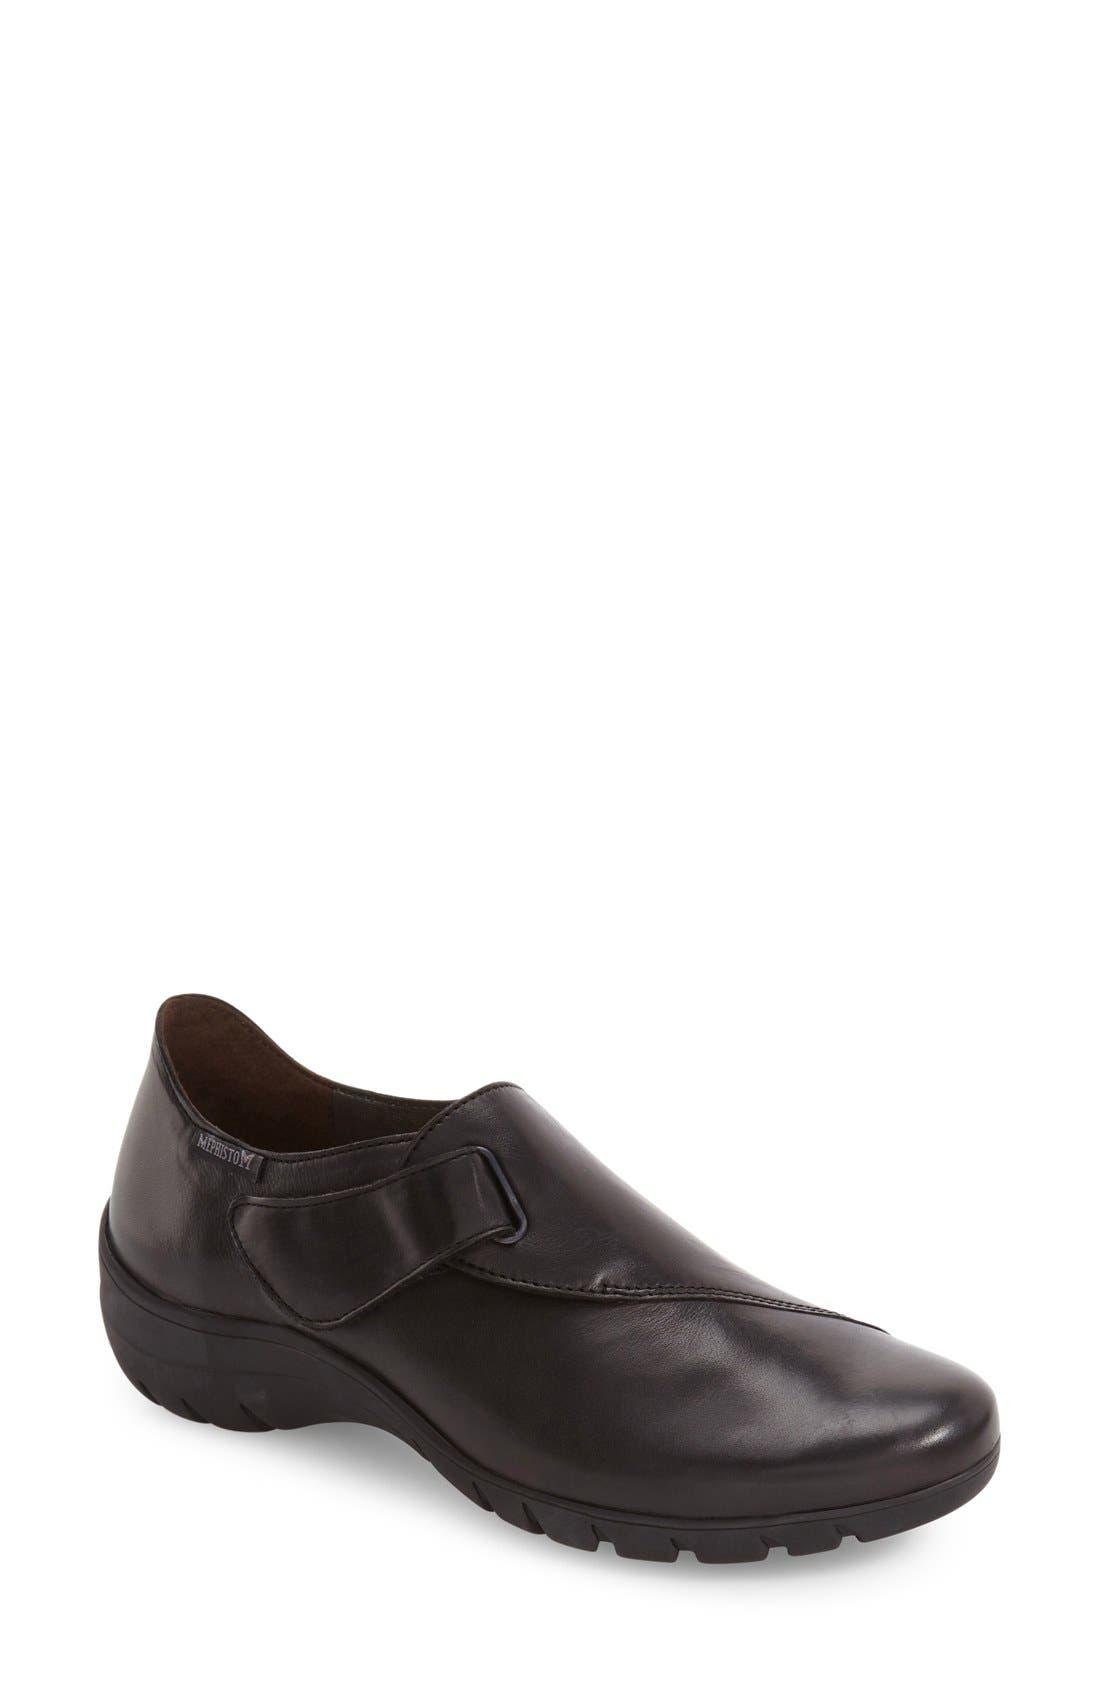 'Luce' Sneaker,                             Main thumbnail 1, color,                             Black Silk Leather